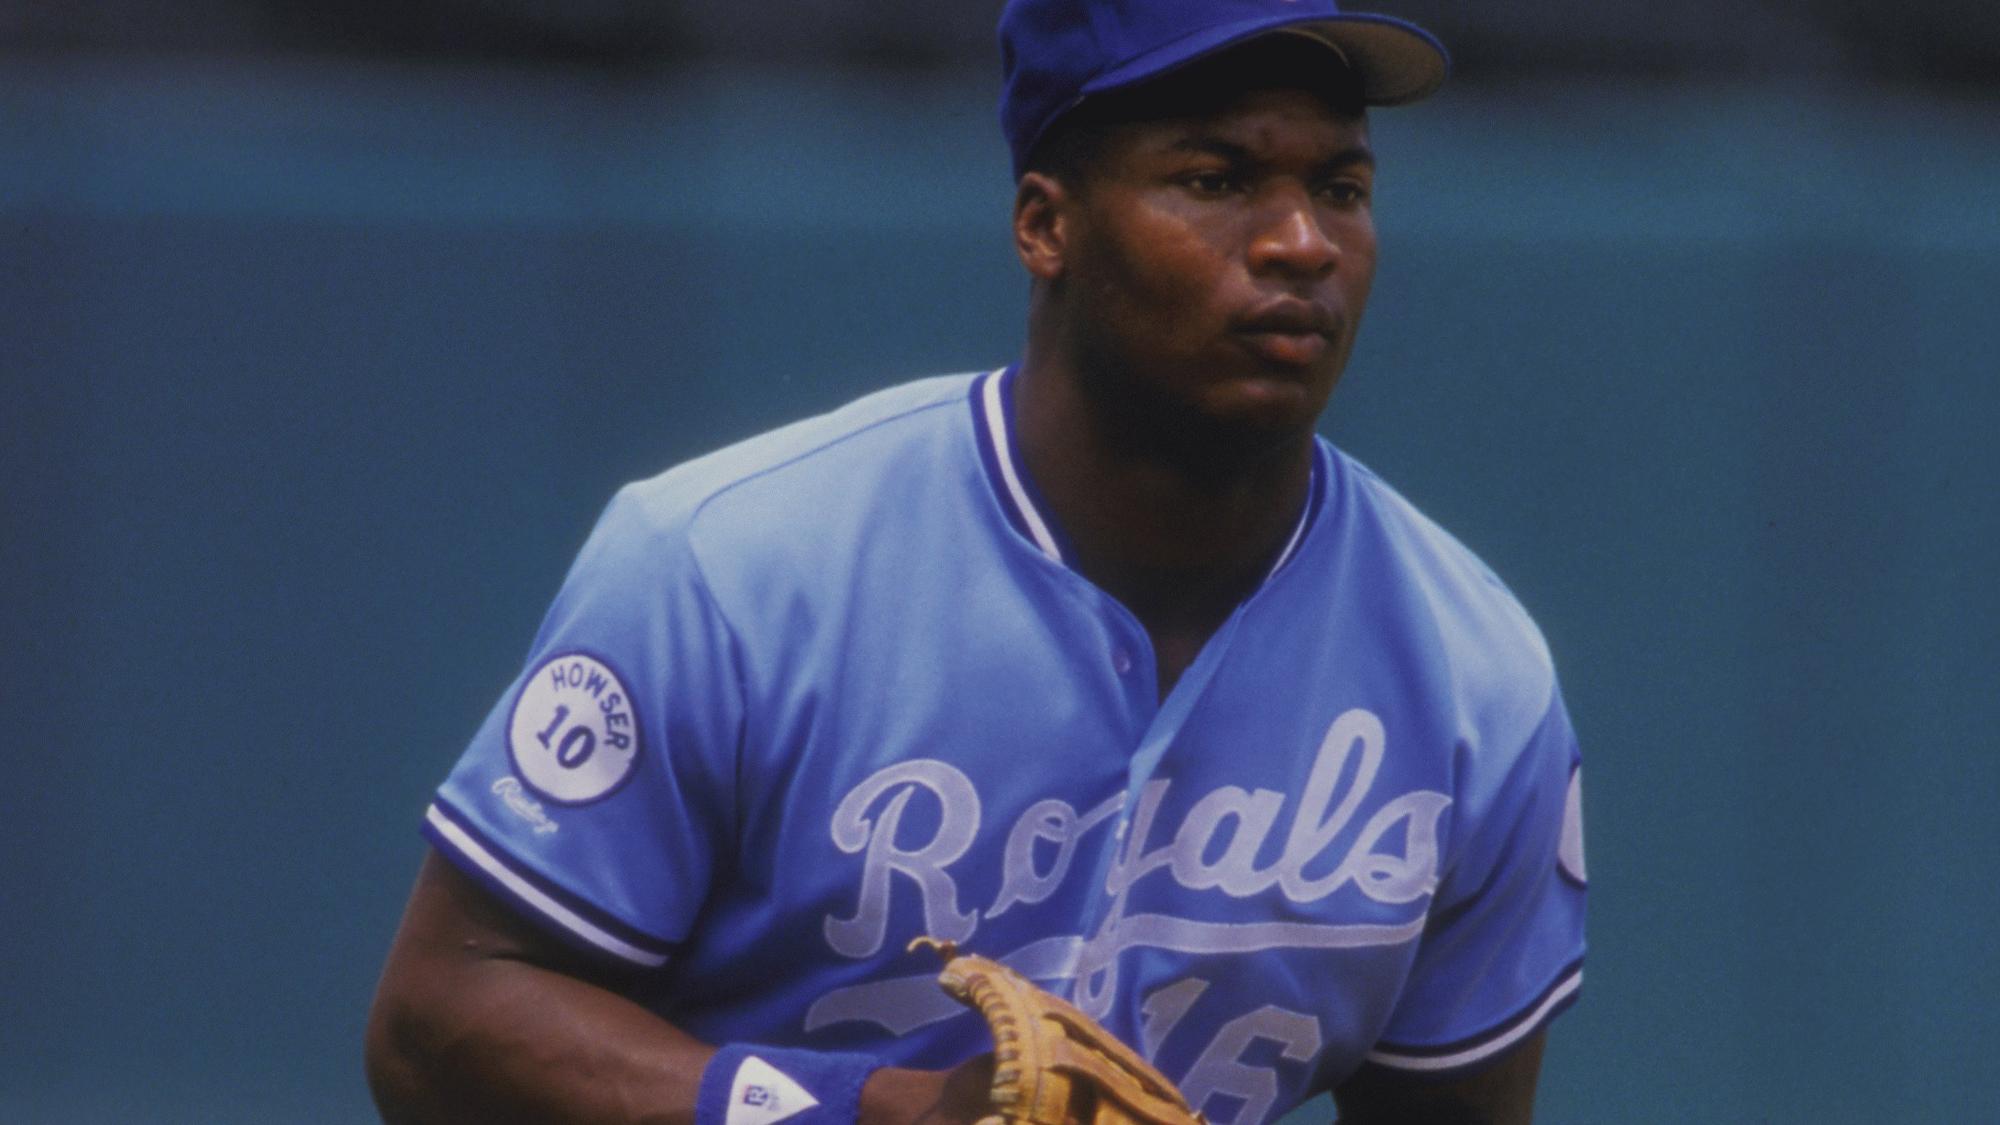 Bo Jackson Oakland Raiders New Arrivals Legend Baseball Player Jersey